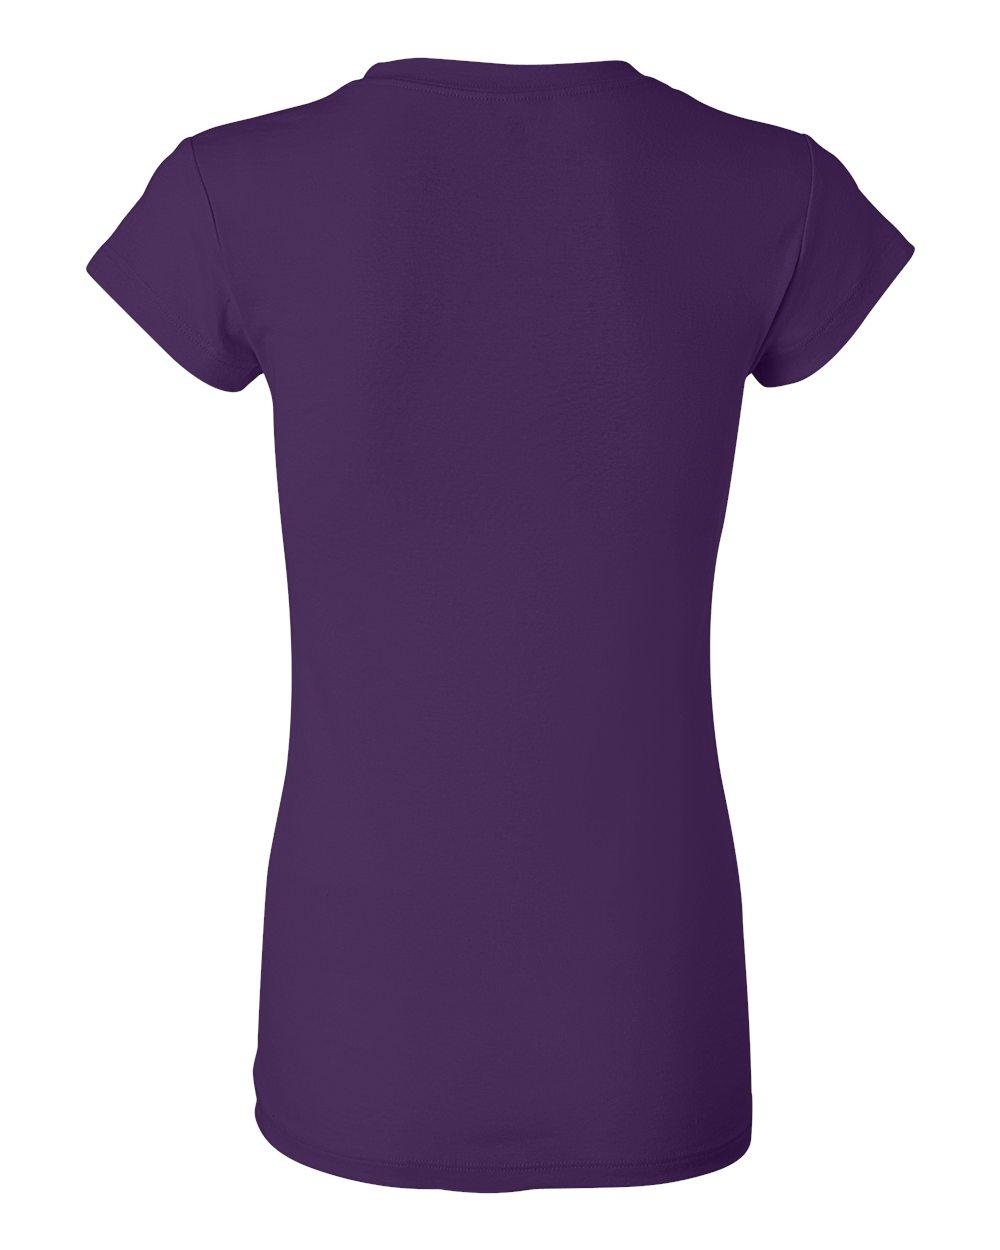 Bella-Canvas-Women-039-s-Sheer-Mini-Rib-Short-Sleeve-T-Shirt-8701-S-2XL thumbnail 31